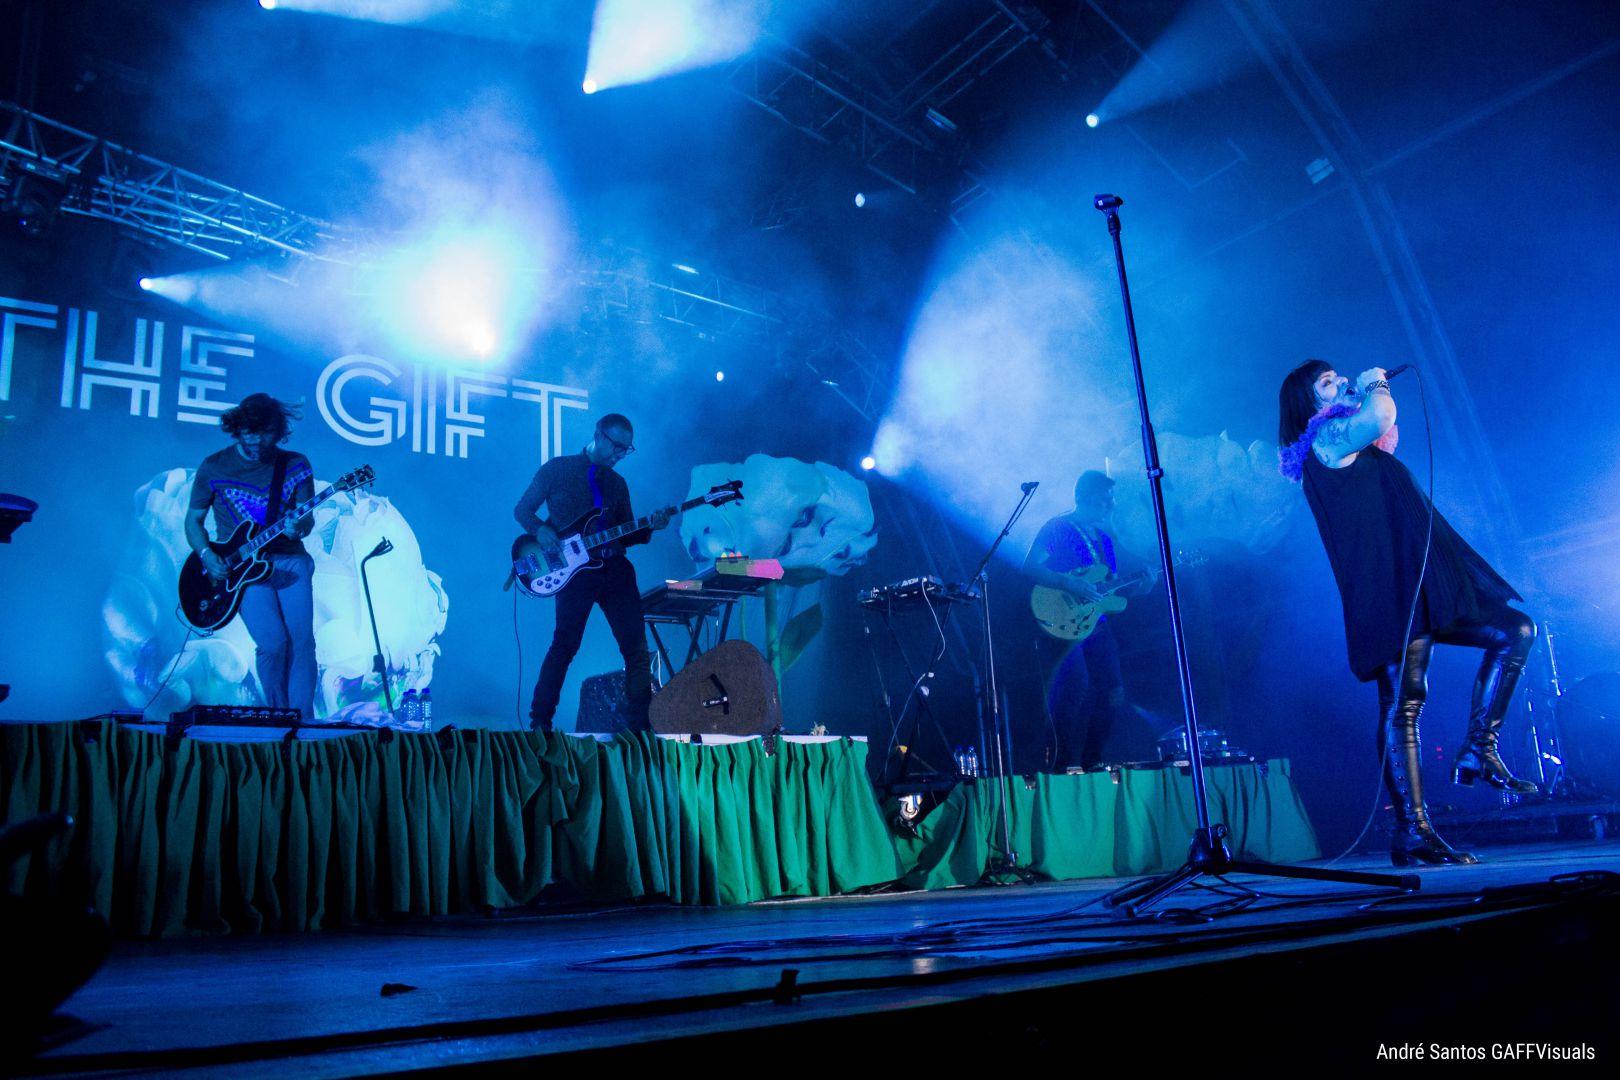 O Sol da Caparica: The Gift